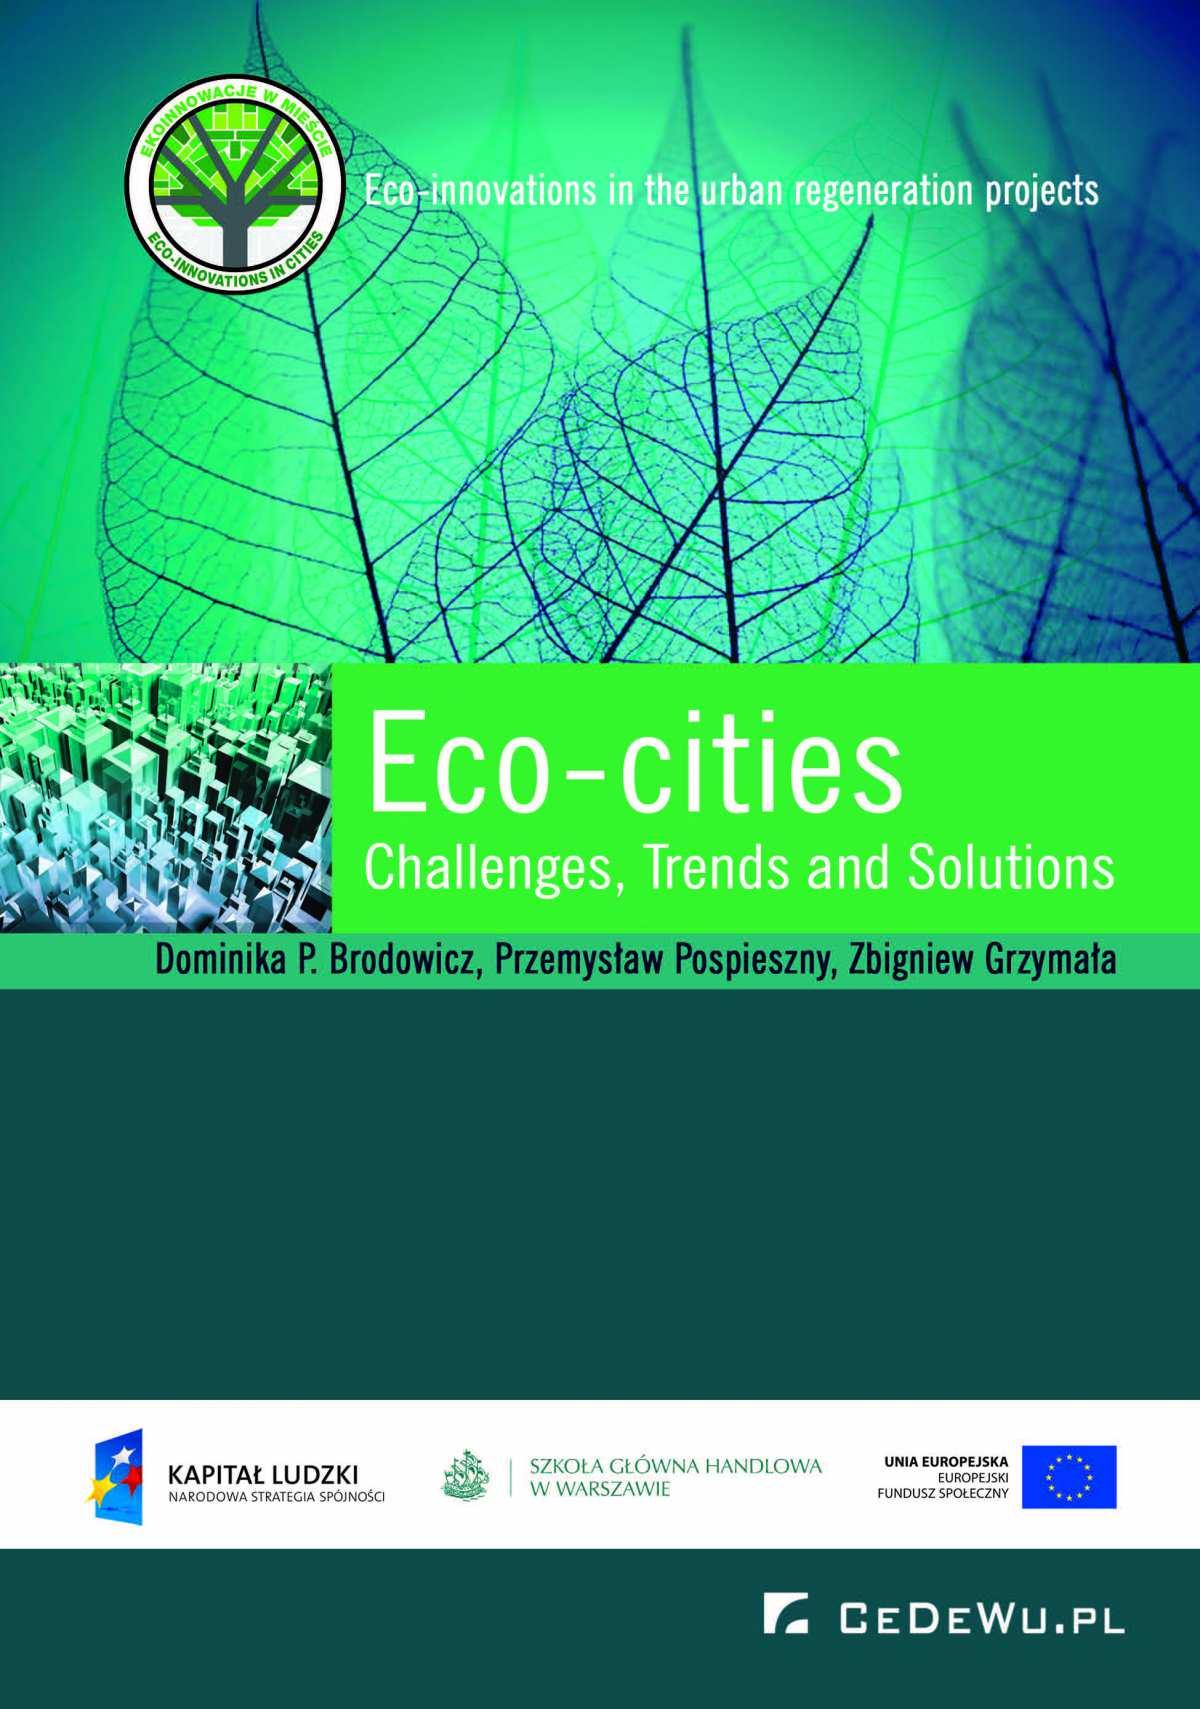 Eco-cities: Challenges, Trends and Solutions - Ebook (Książka EPUB) do pobrania w formacie EPUB